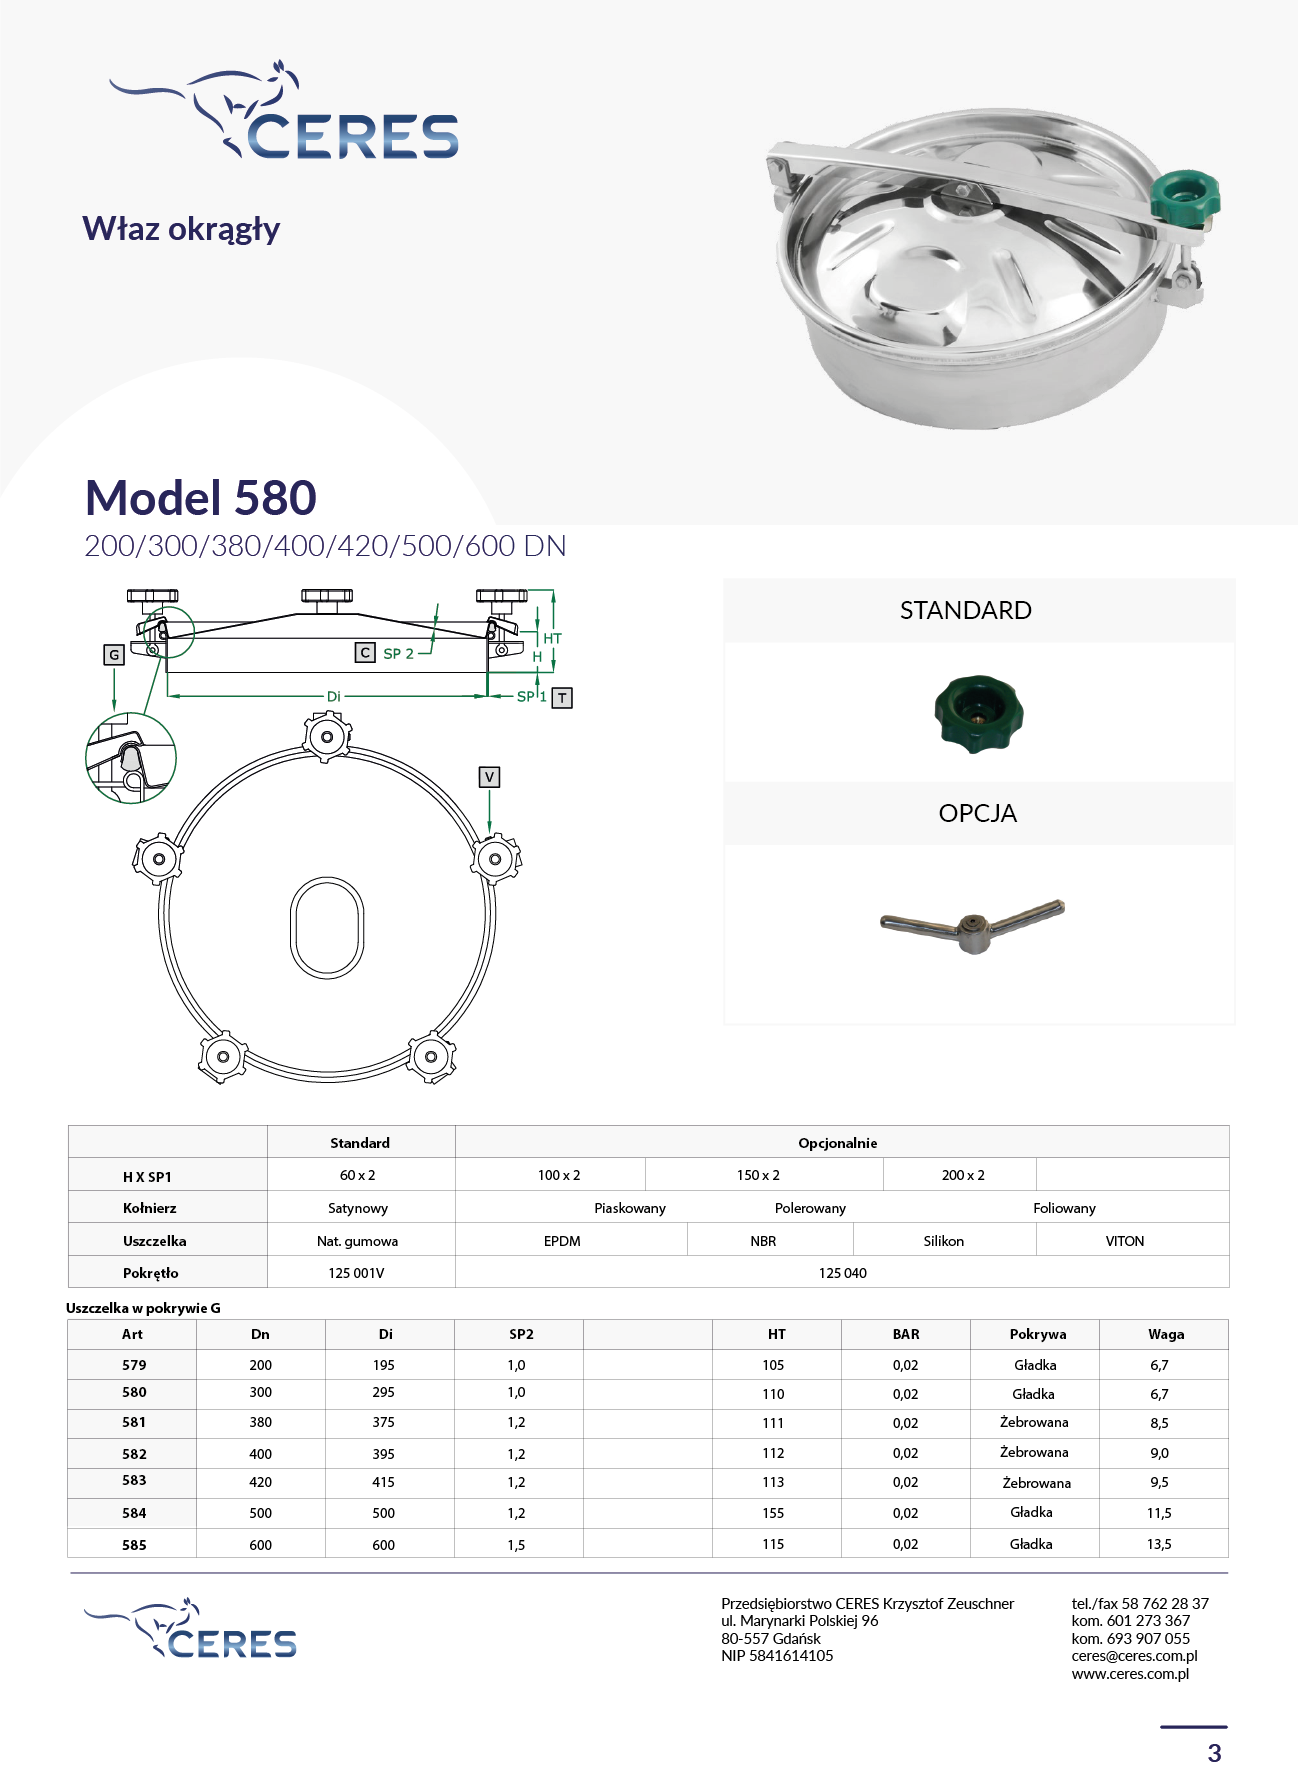 MODEL 580